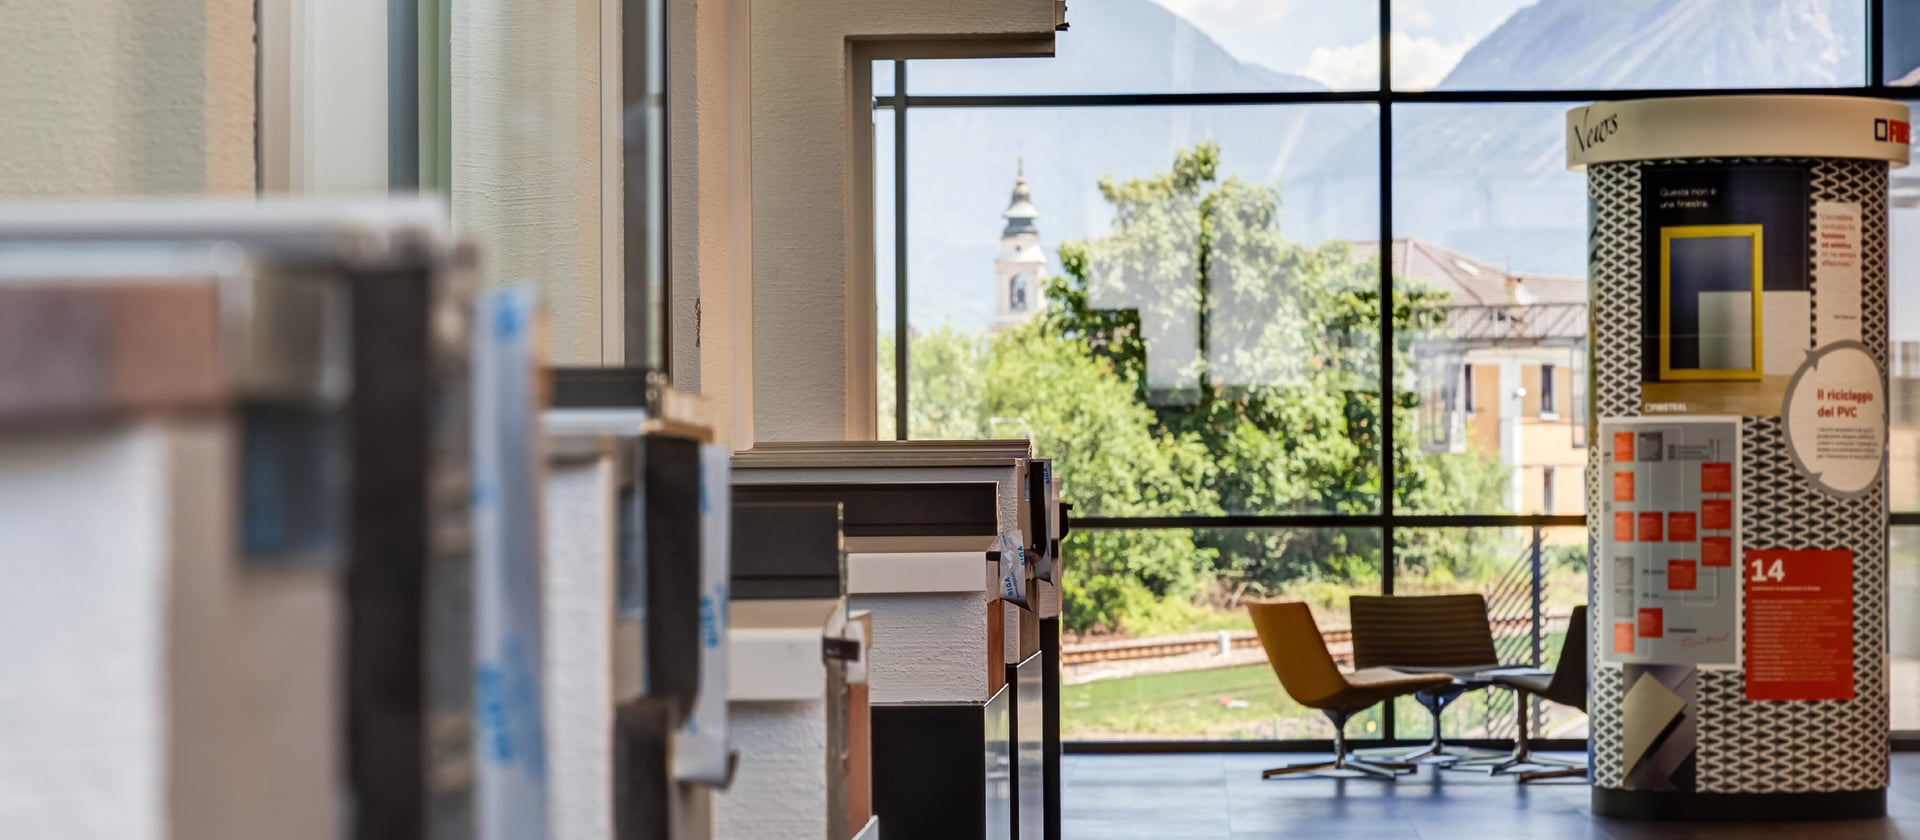 Studio Finstral Borgo